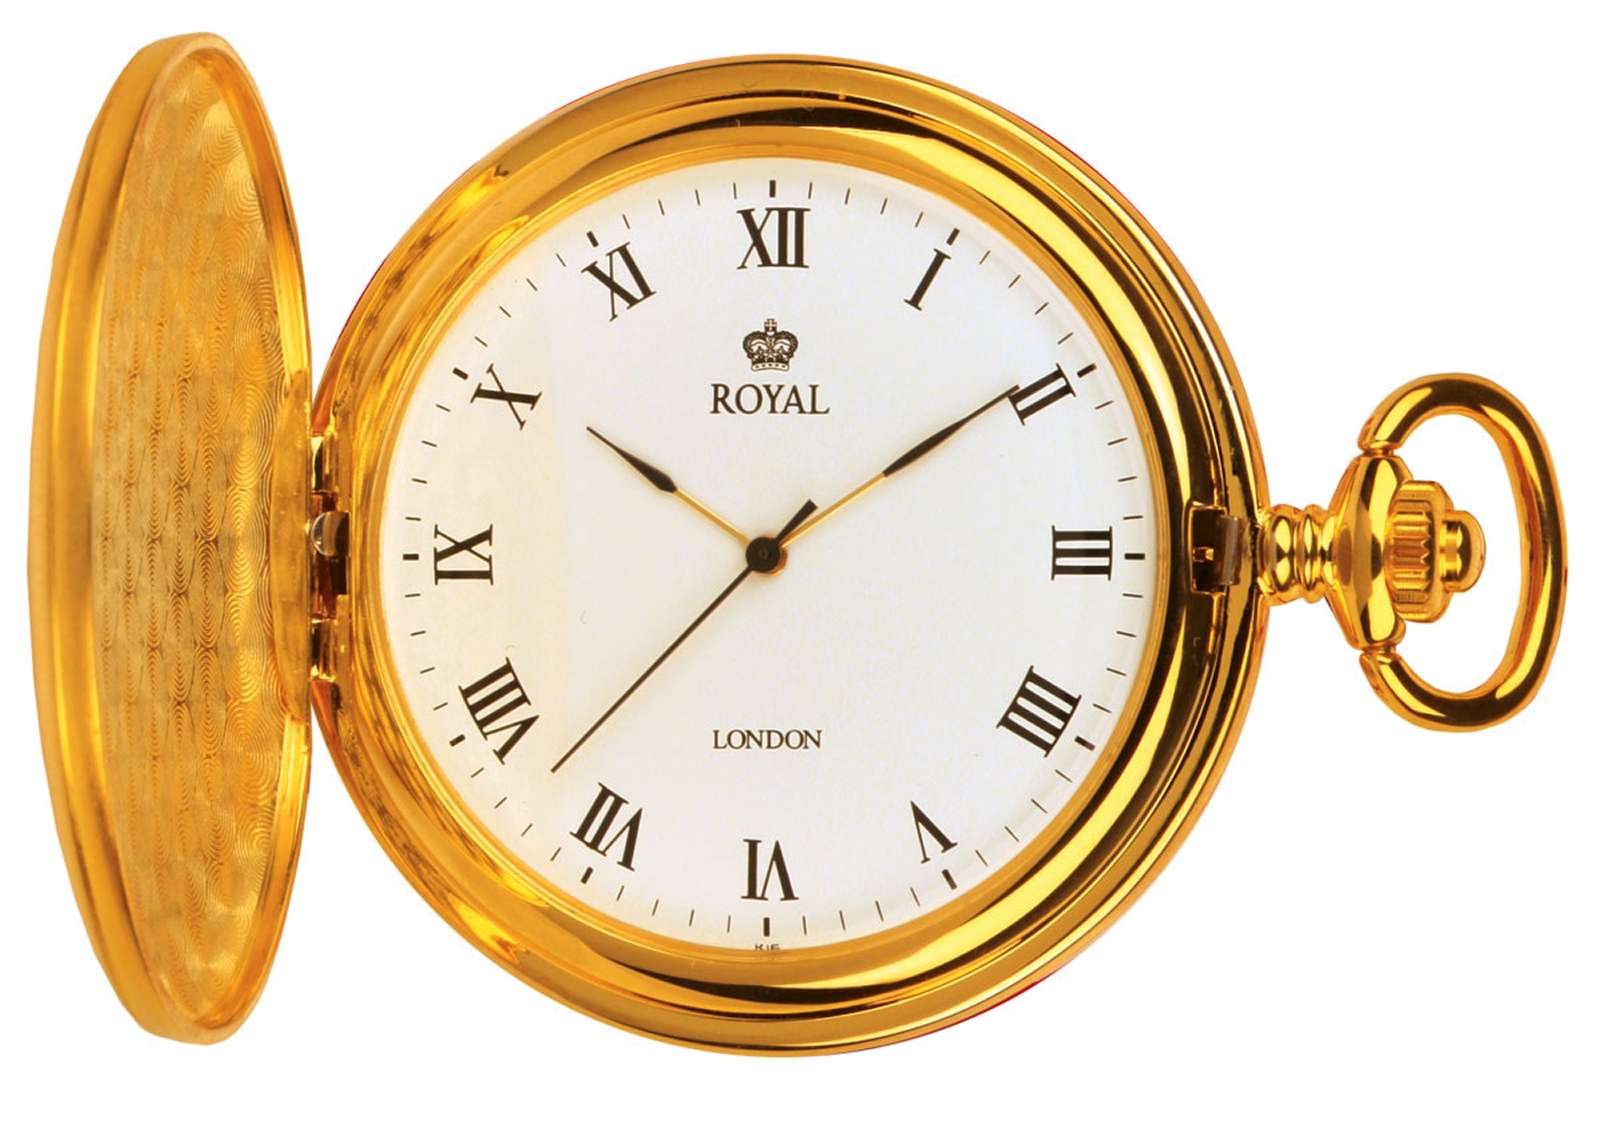 Alexander of Greece's Pocket Watch